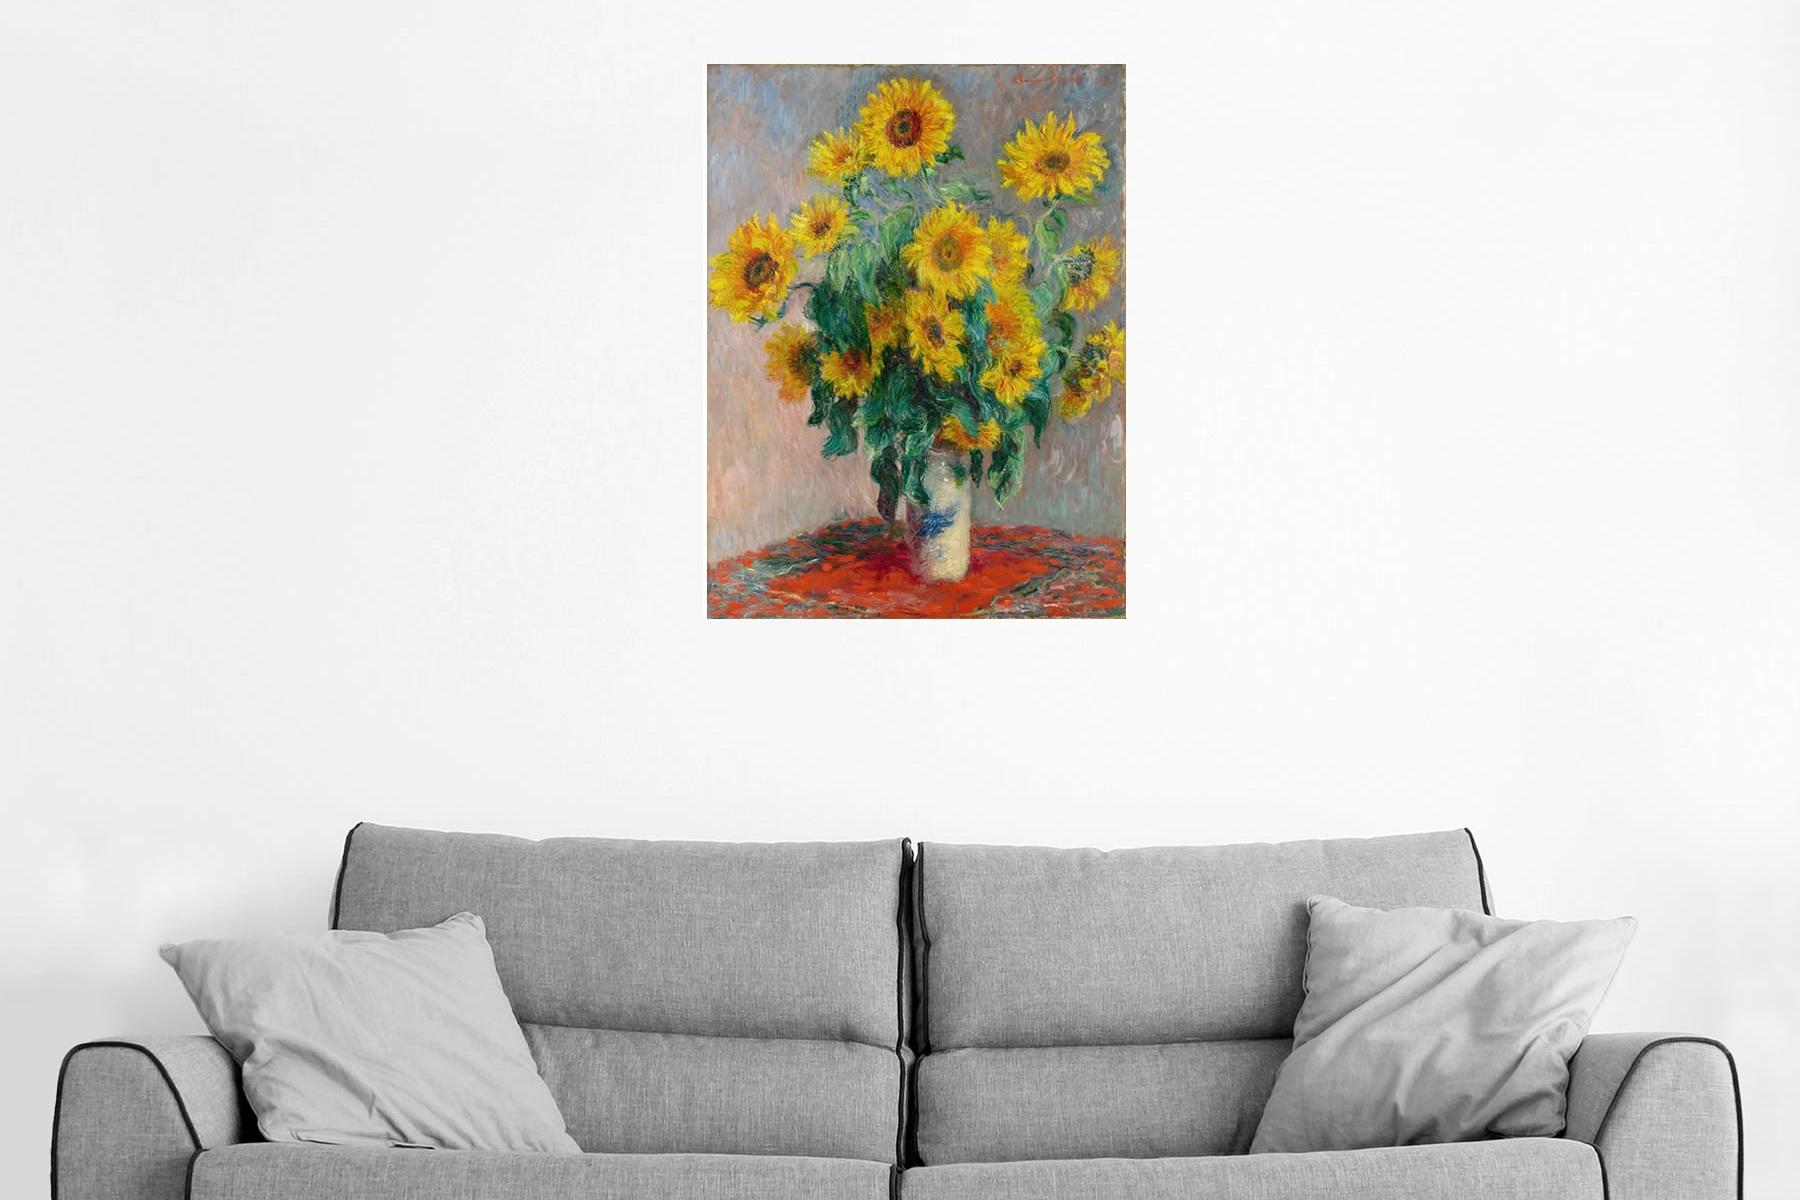 sunflowers_18x24_poster.jpg